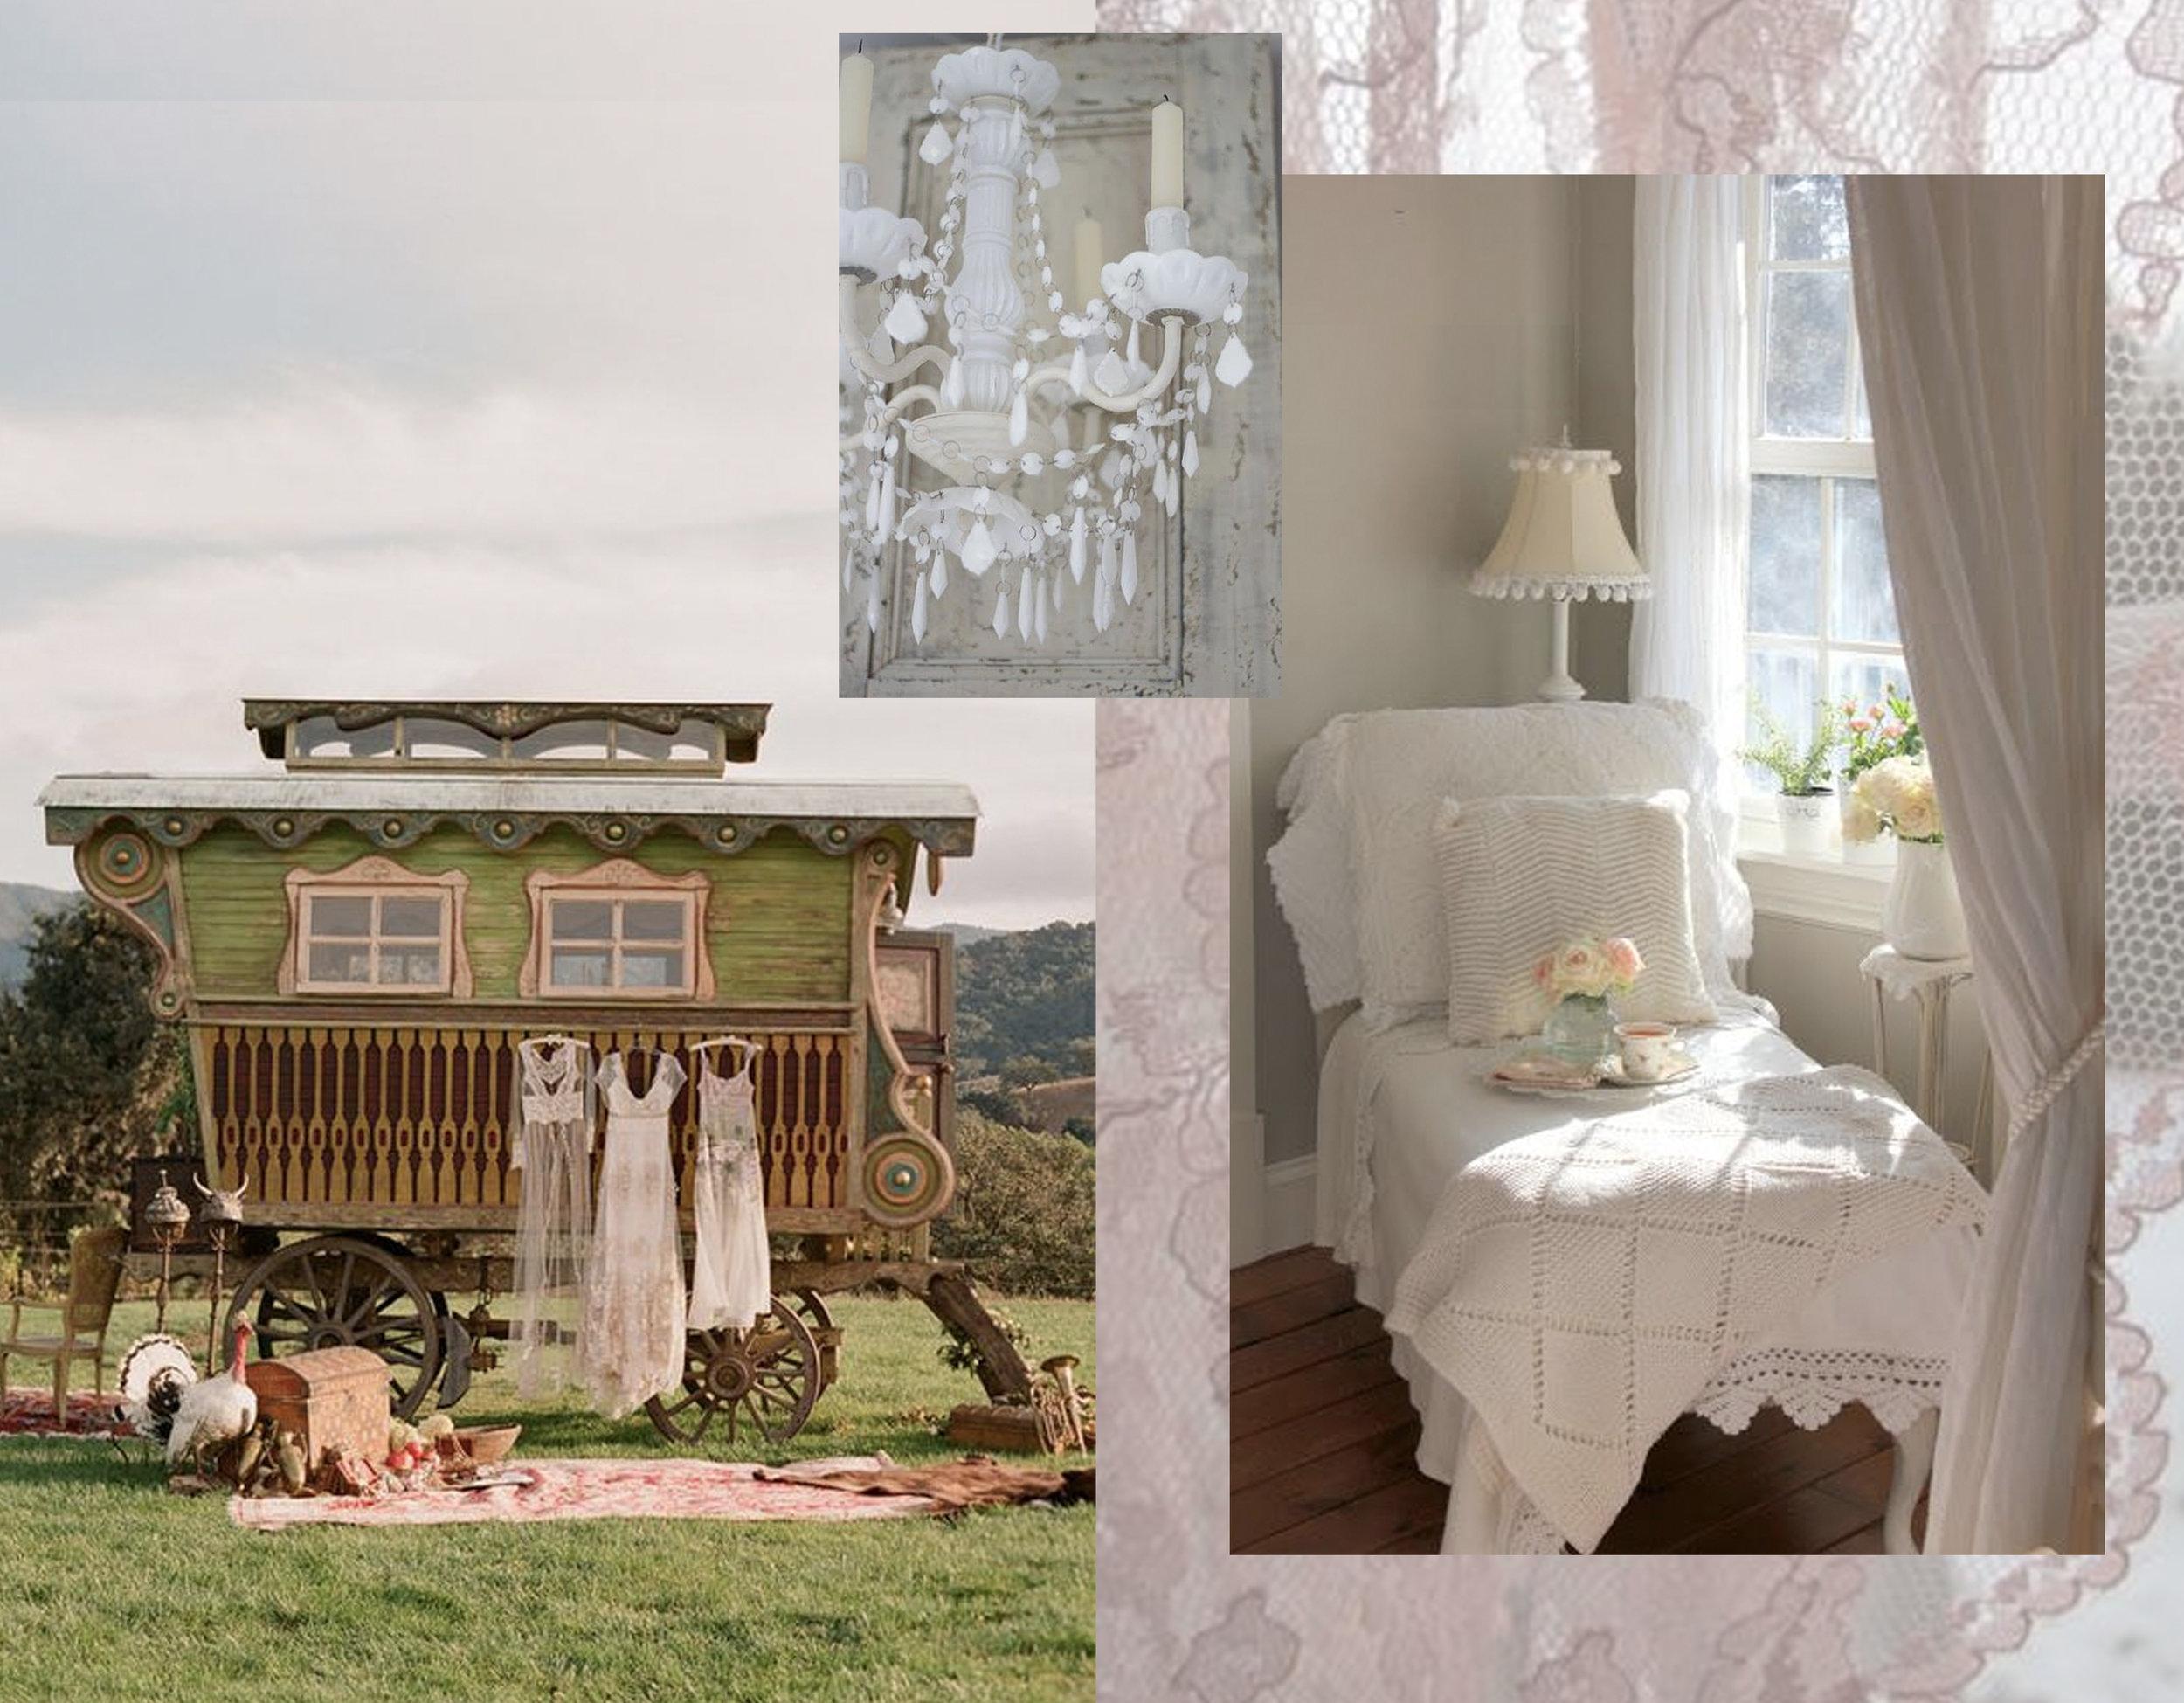 vagon via  Grey Likes Weddings  - hanging lamp via  Tumblr  - romantic interior via  Warren Grove Graden